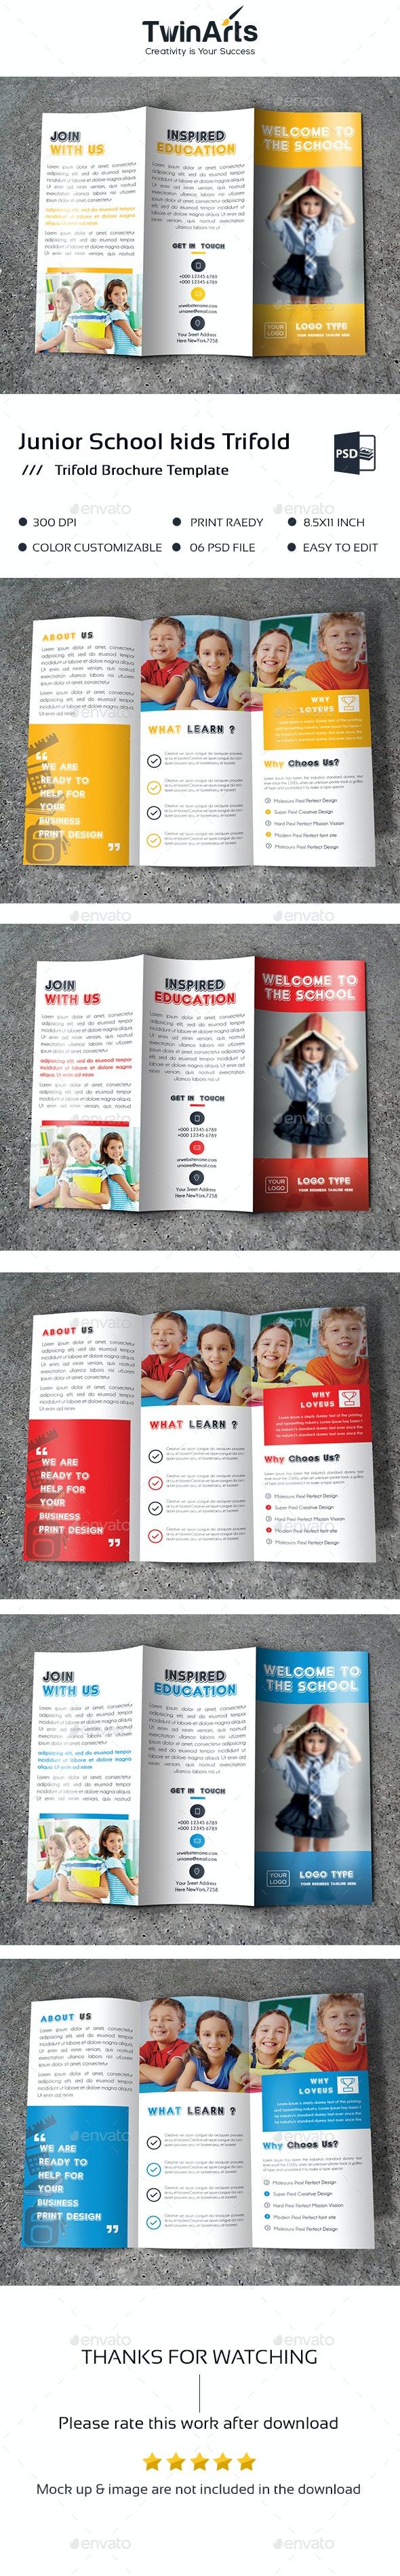 Junior School kids Trifold Brochure - Brochures Print Templates